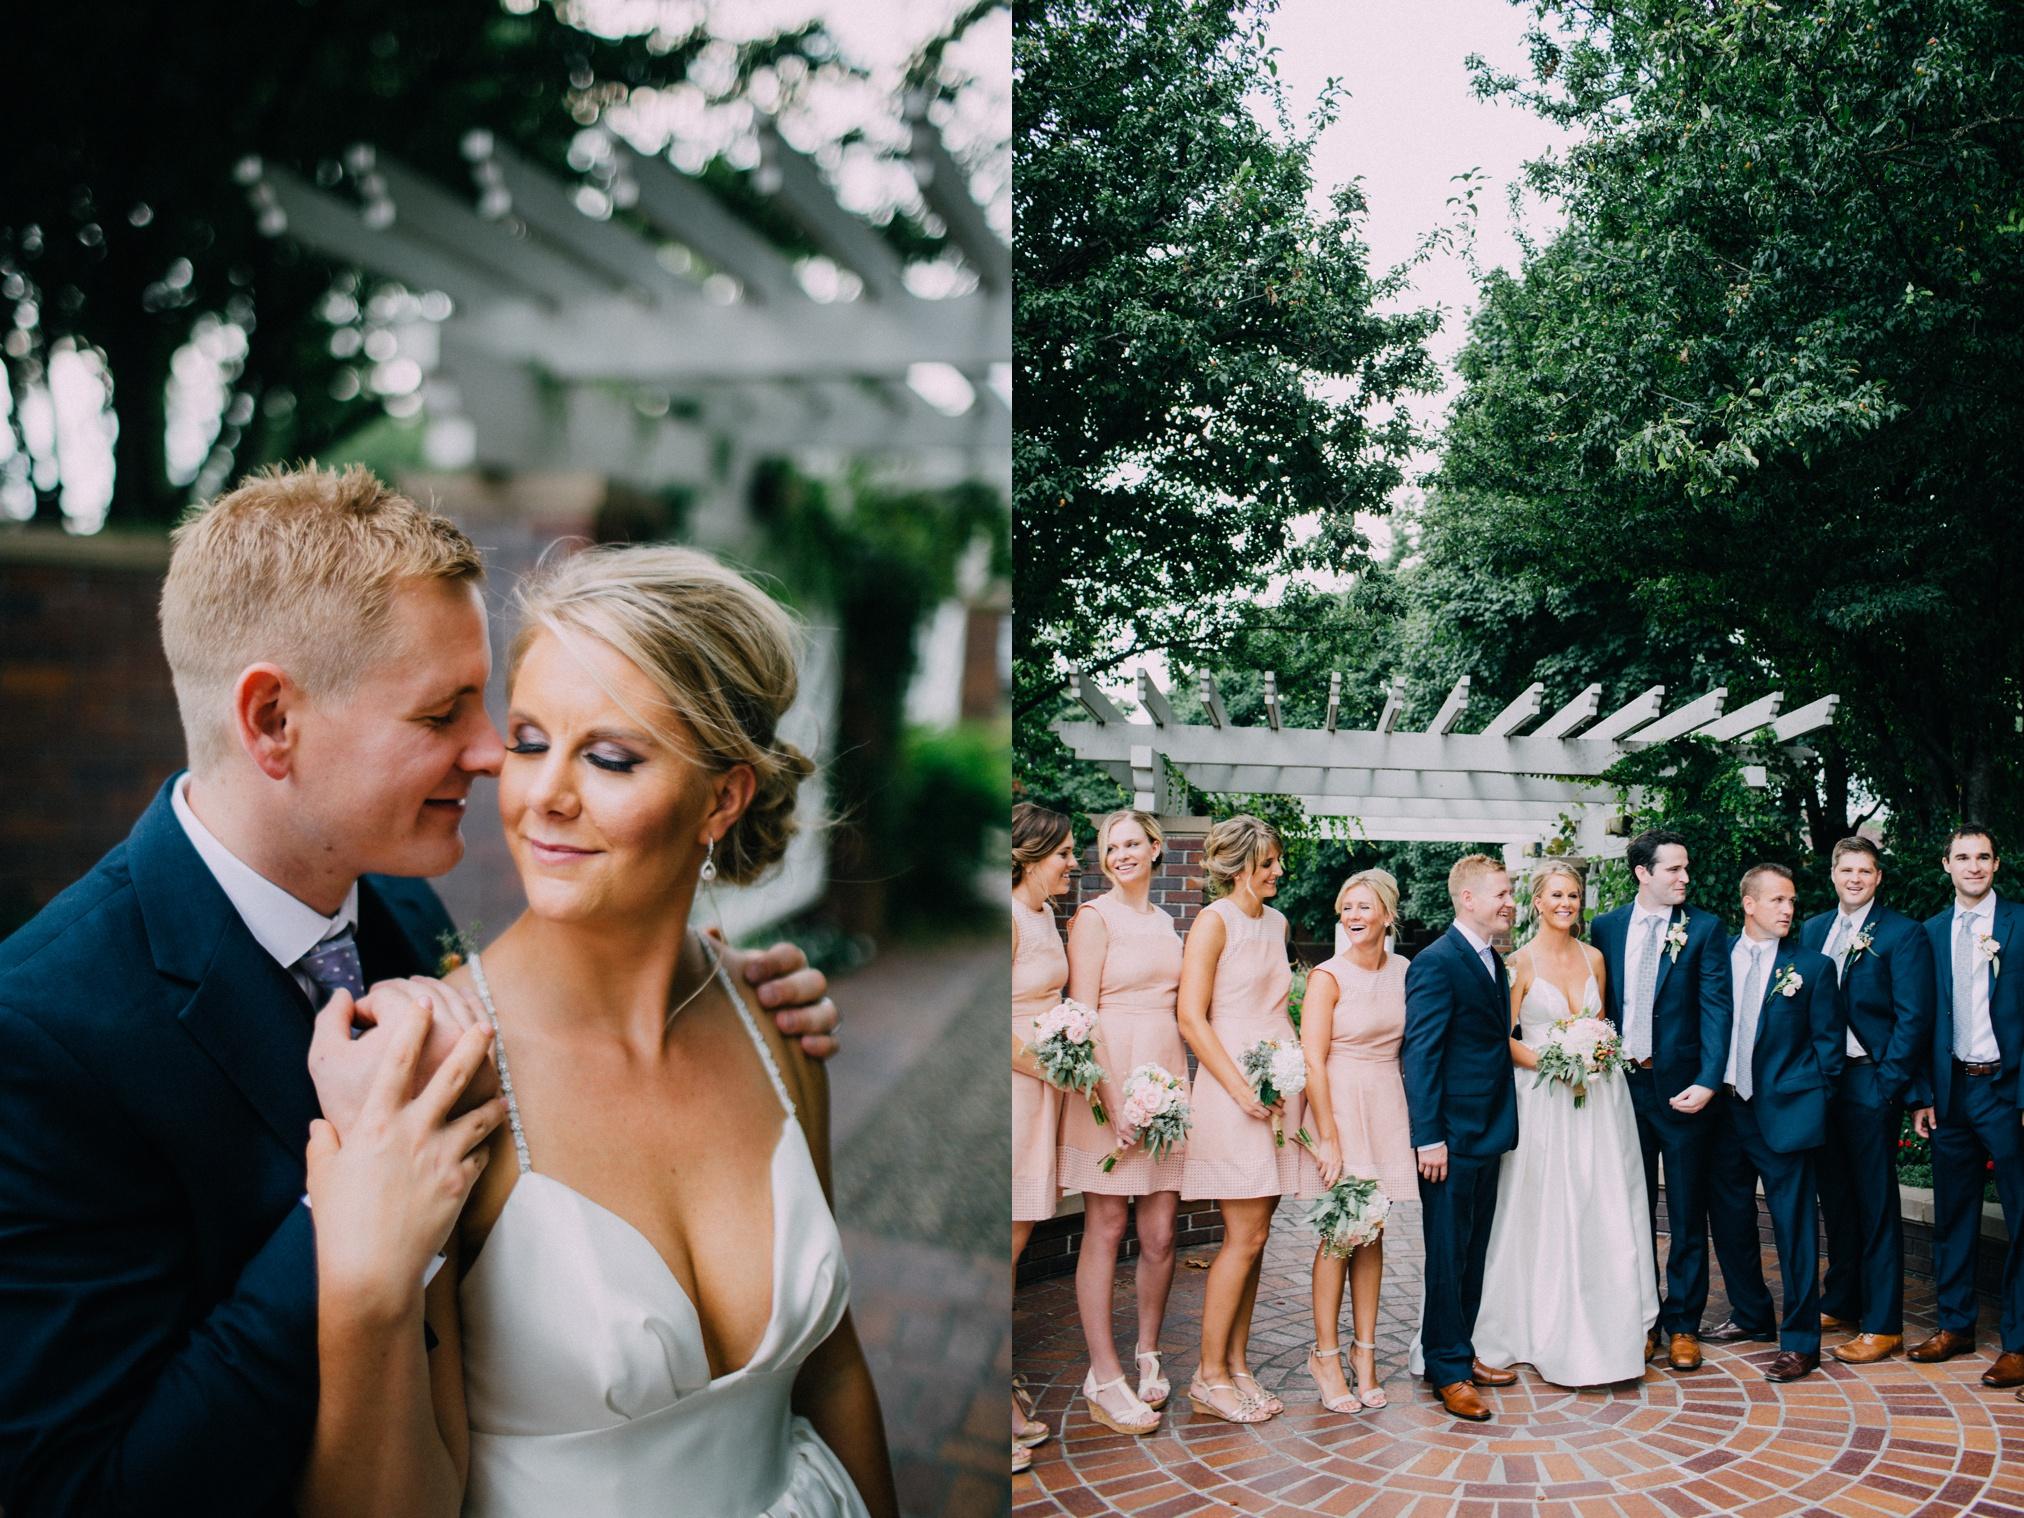 brenna+michael_wedding-492.jpg